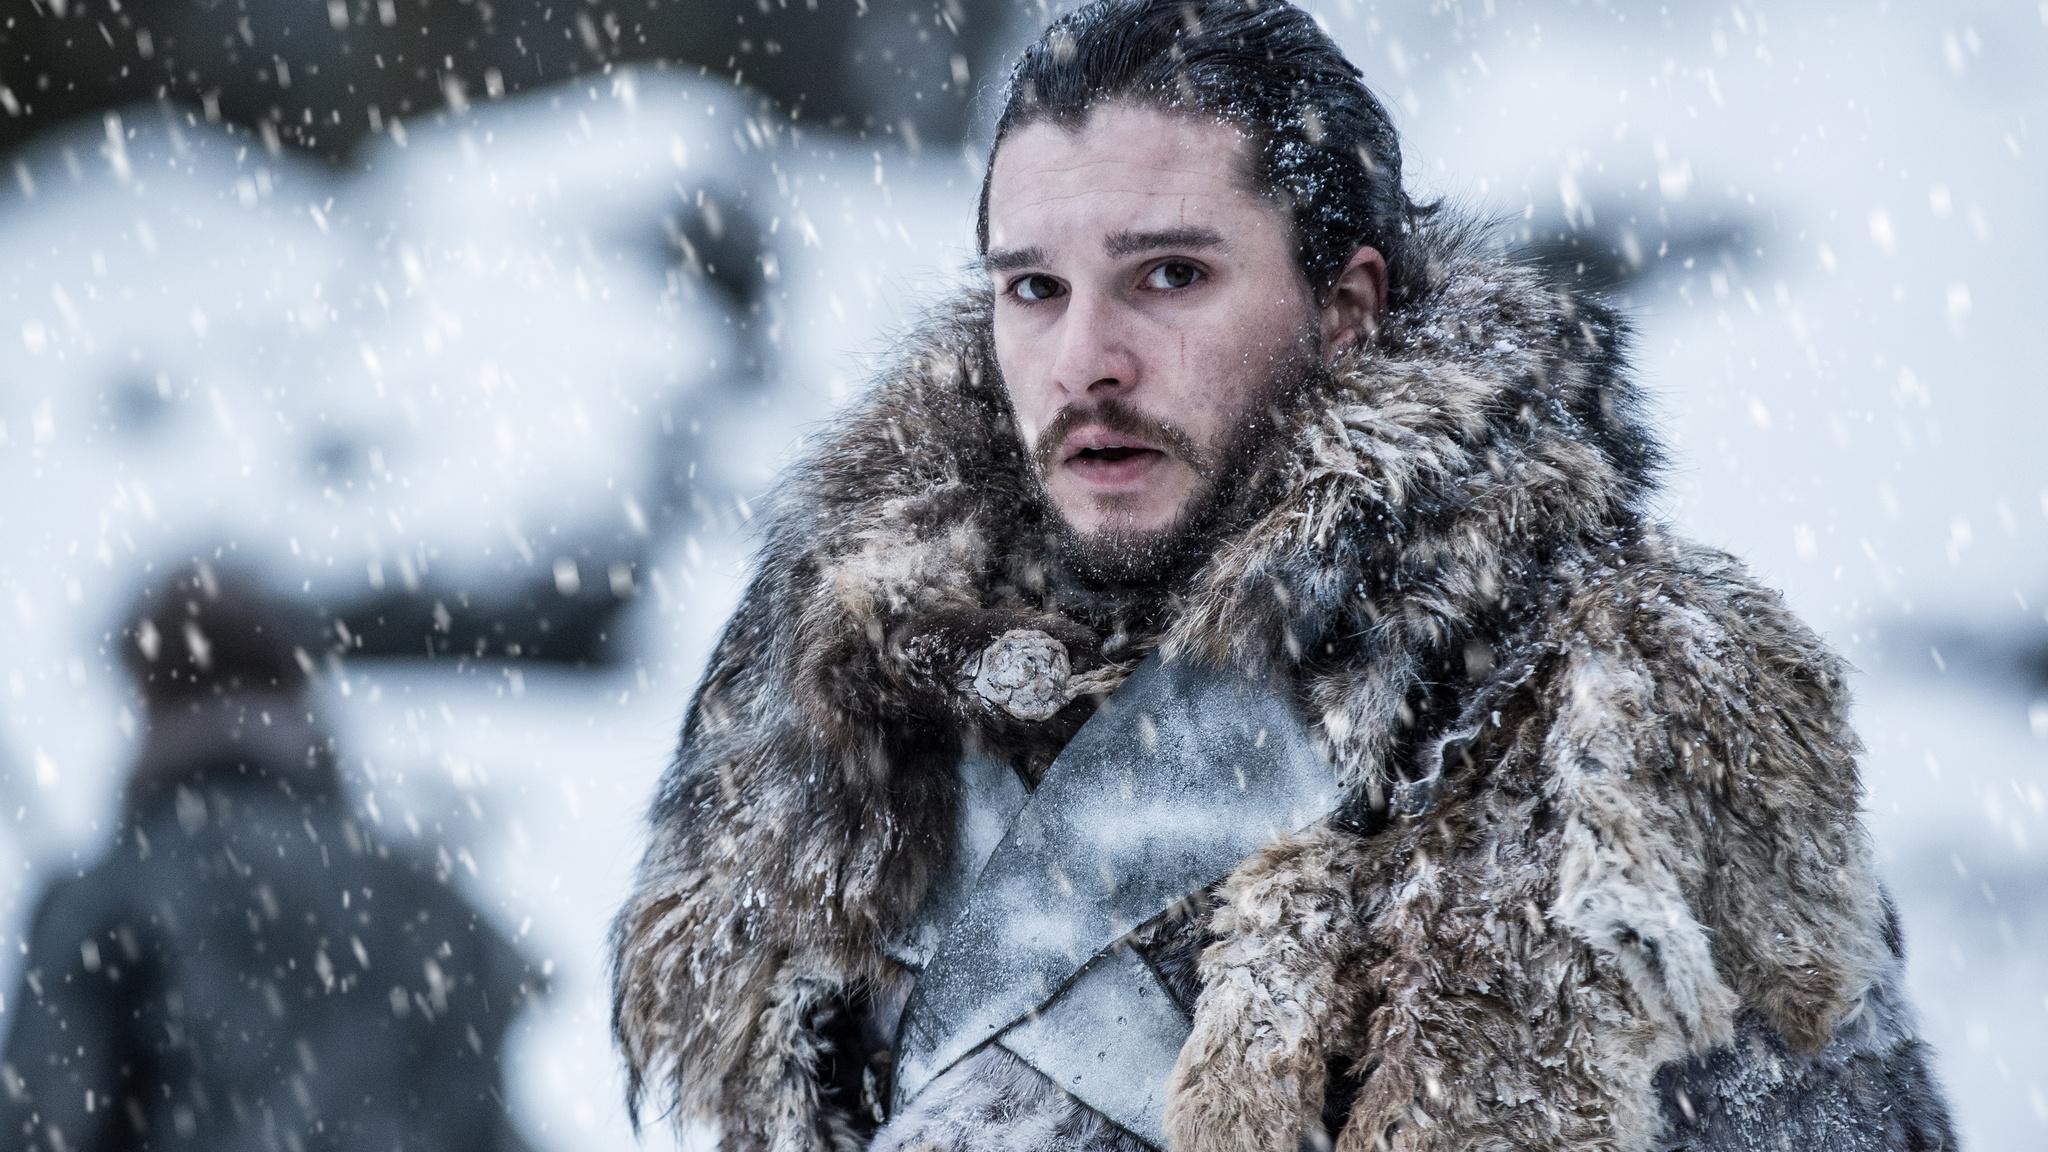 2048x1152 Jon Snow Beyond The Wall Game Of Thrones 4k 2048x1152